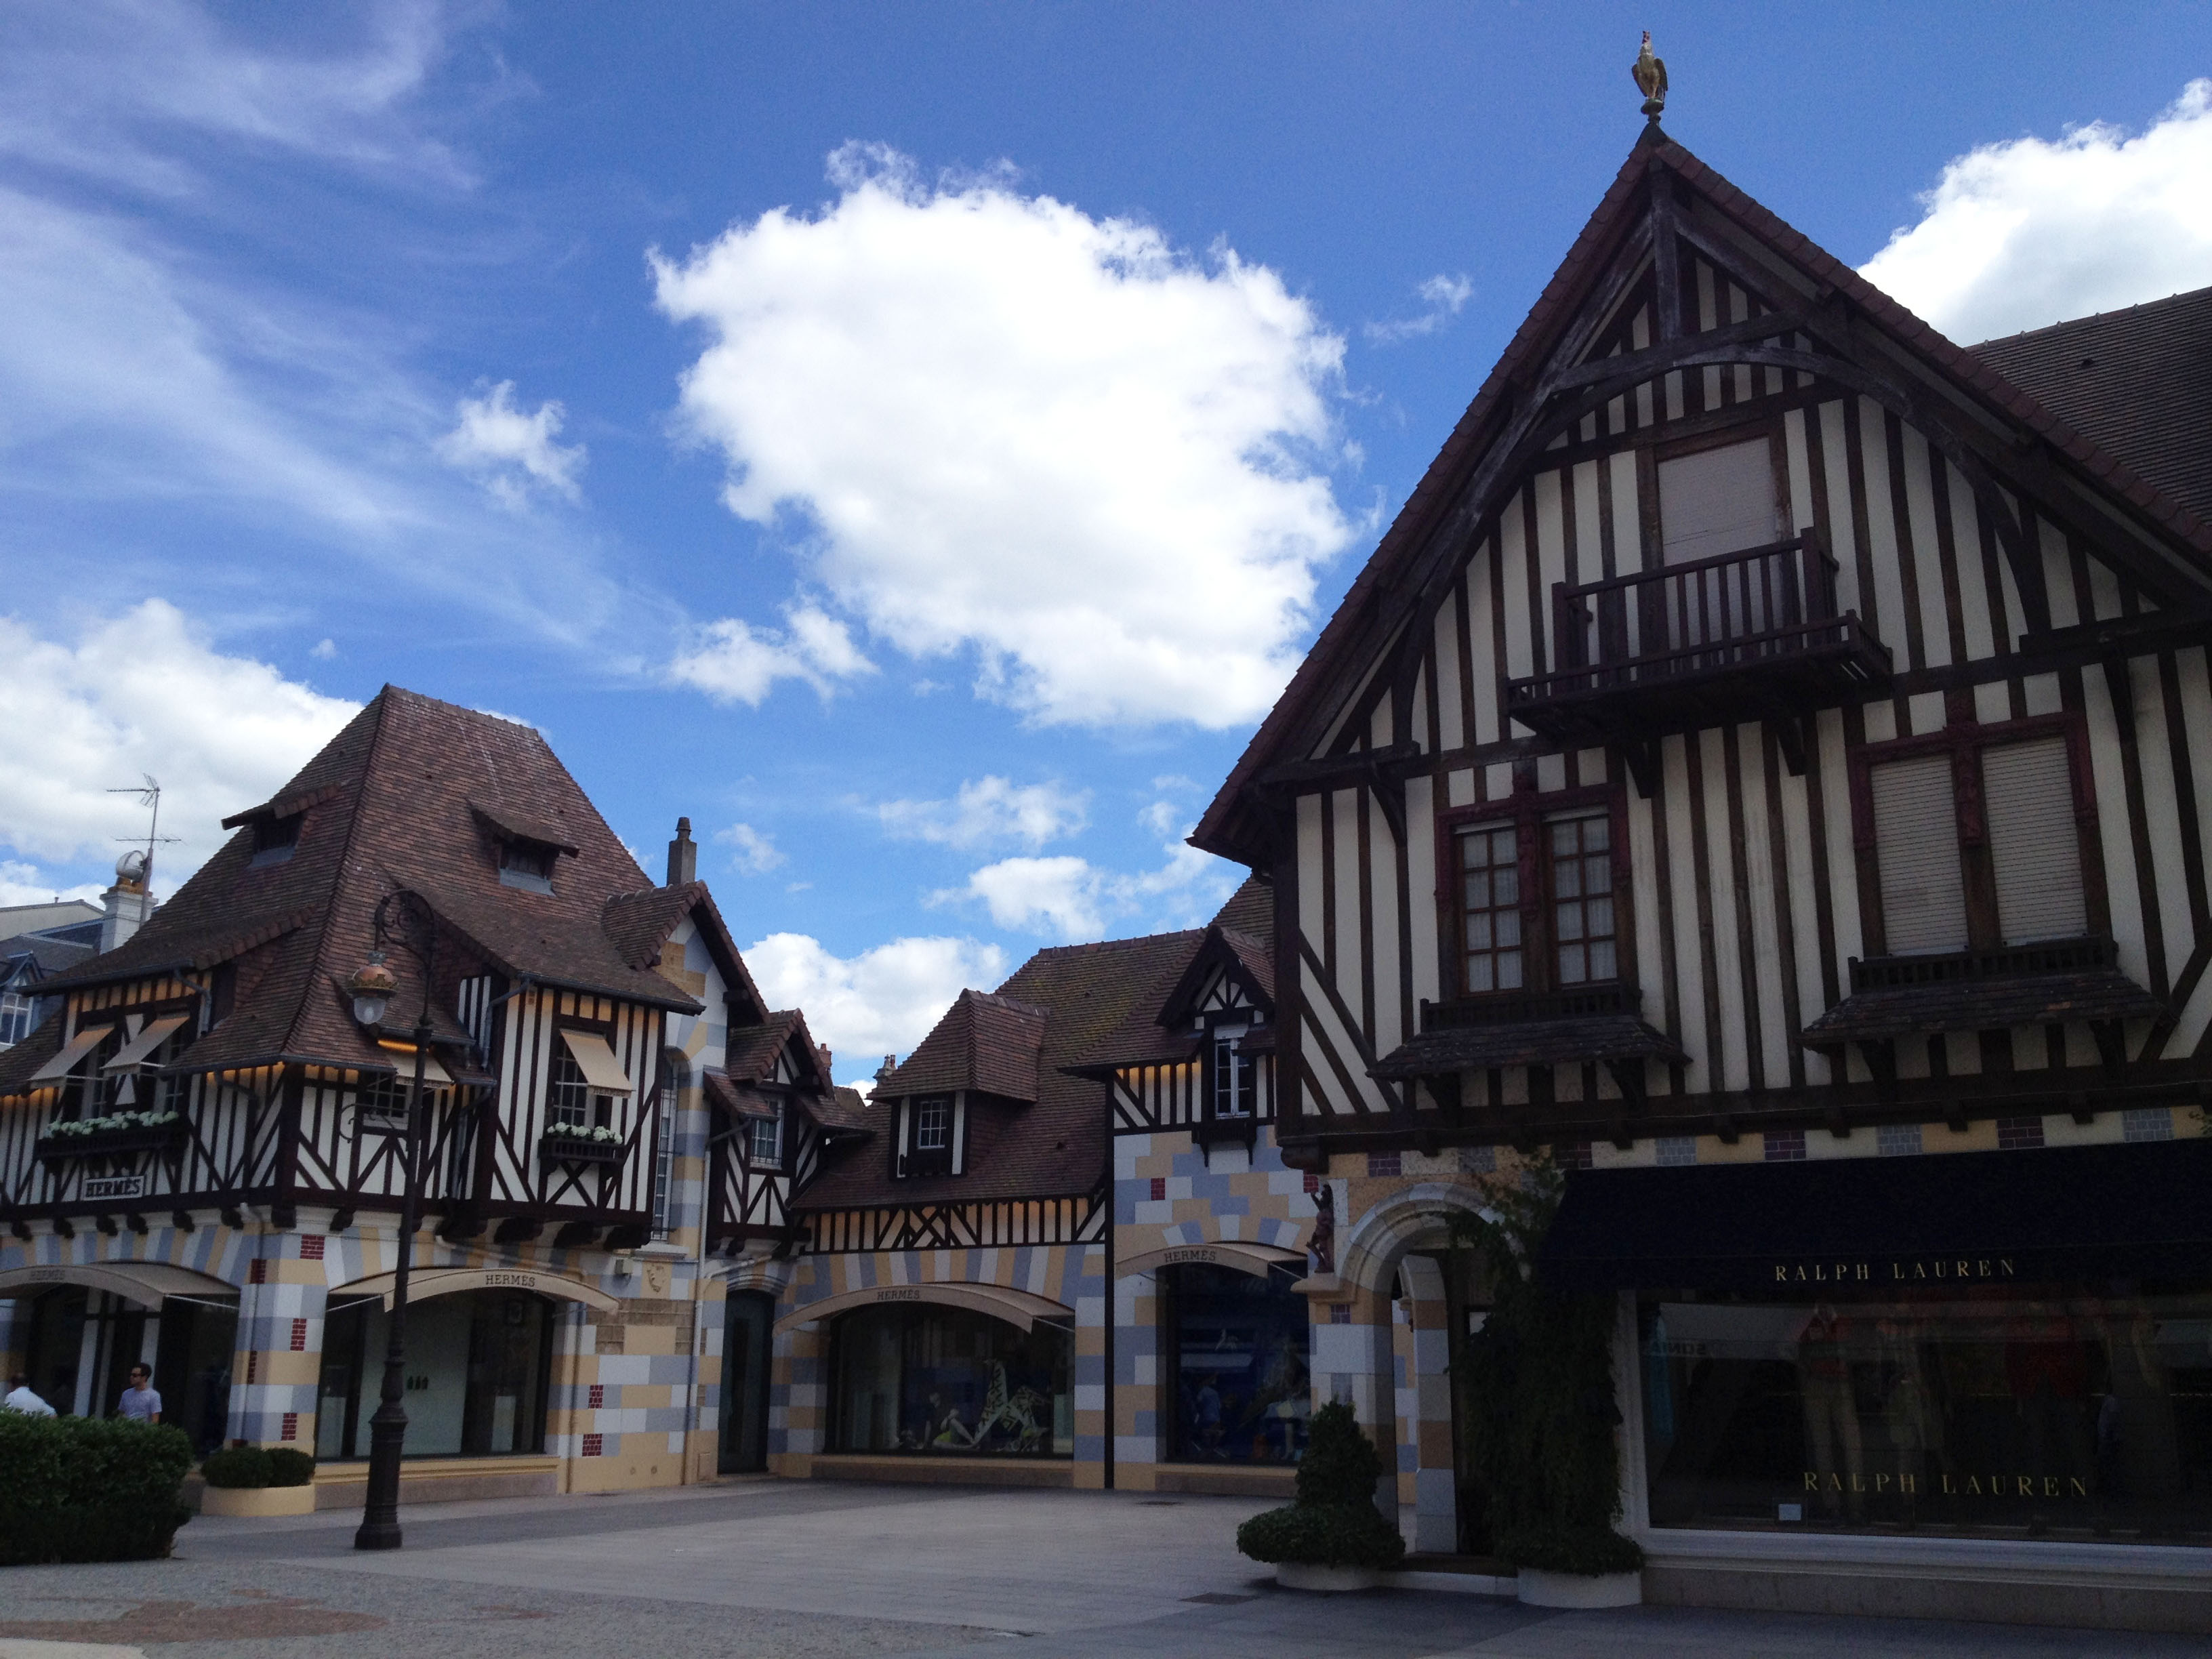 A Sunday in Deauville – Ritournelle